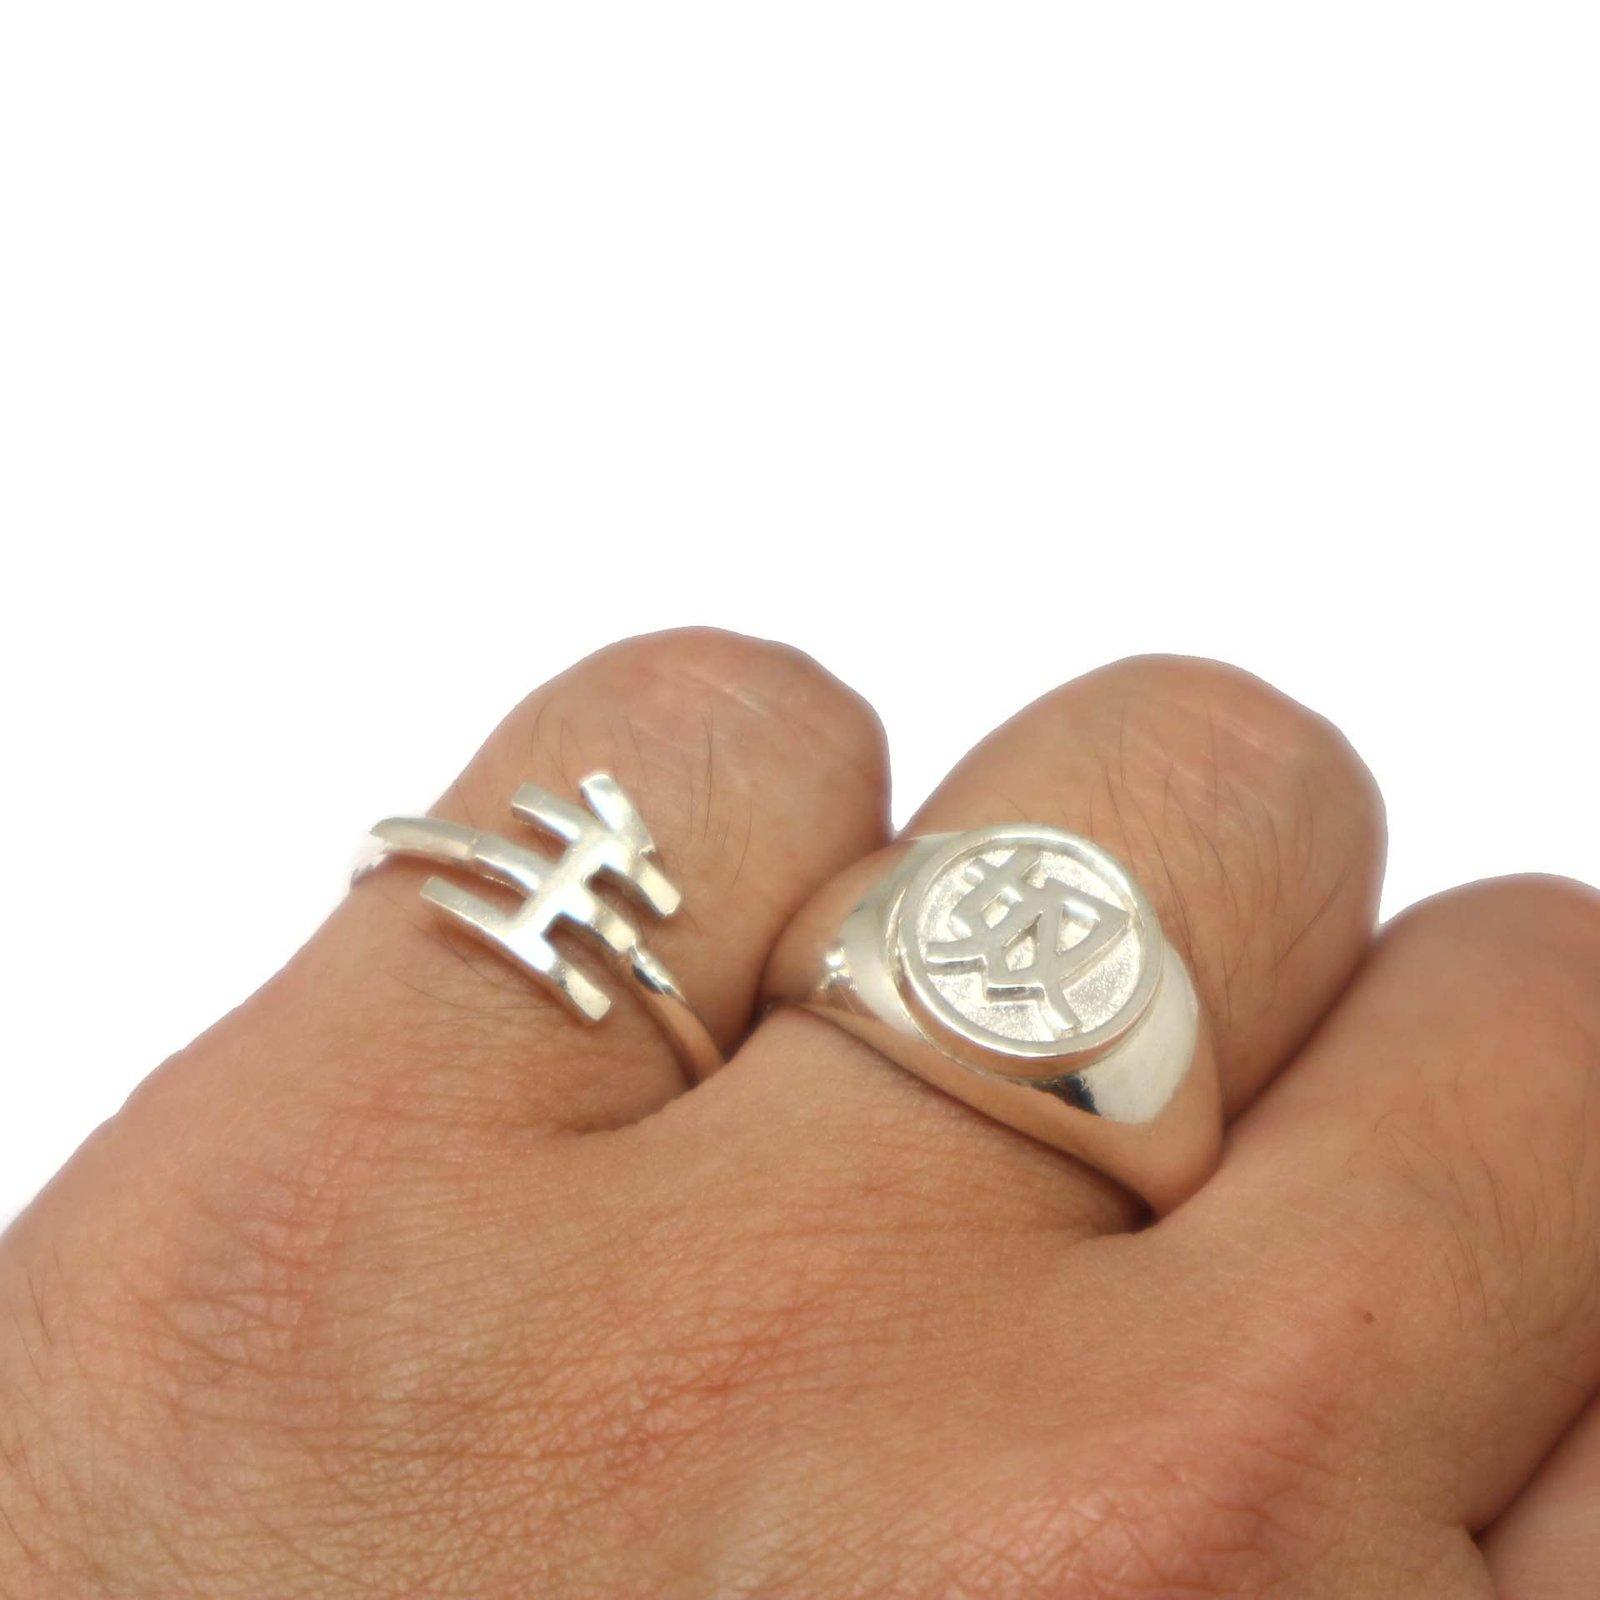 Master and Slave Japanese Bdsm Ring Set